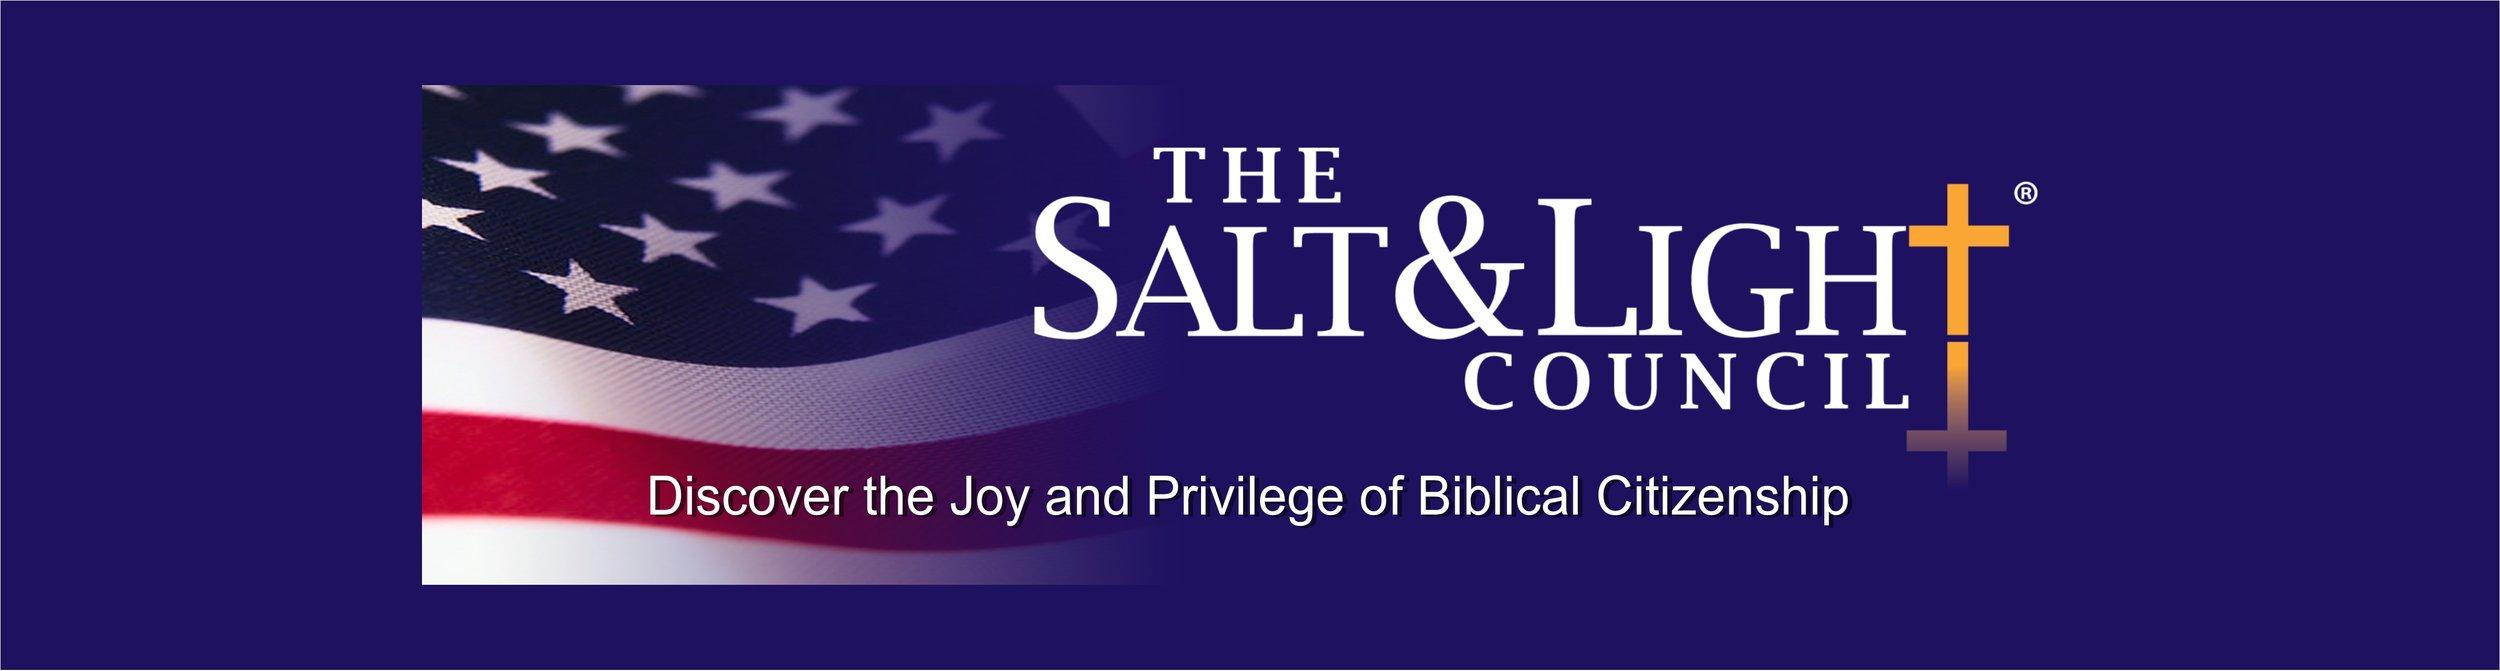 Salt & Light Banner.png